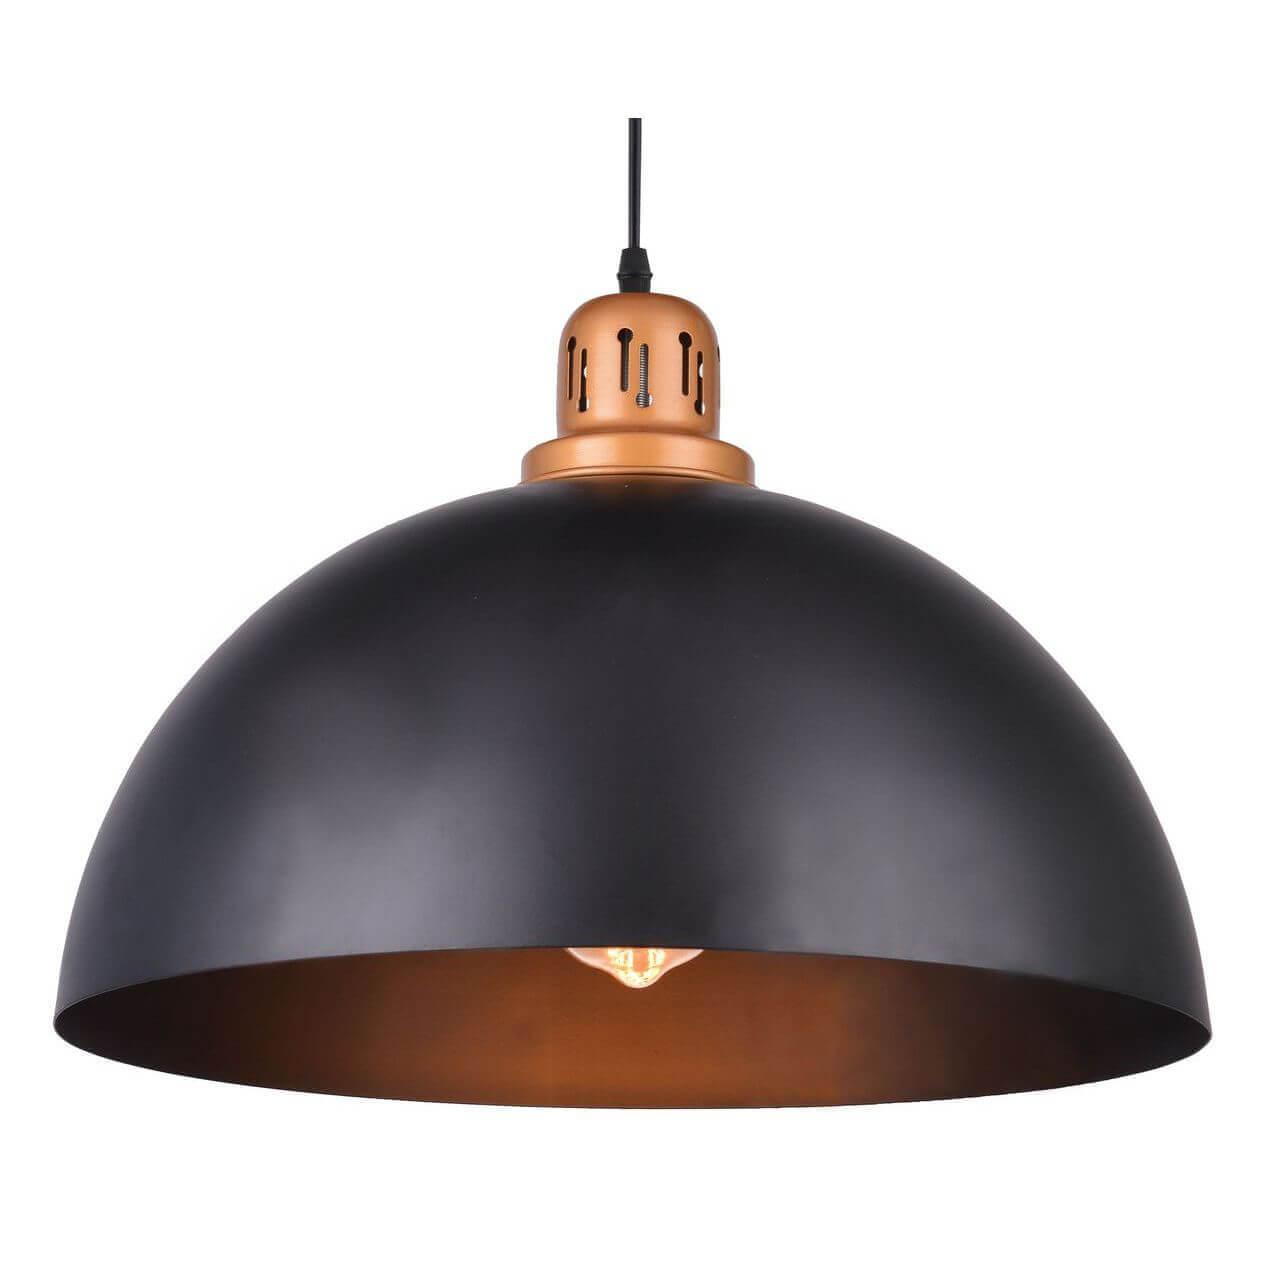 Светильник Arte Lamp A4249SP-1BK Eurica светильник arte lamp a4248sp 1bk eurica